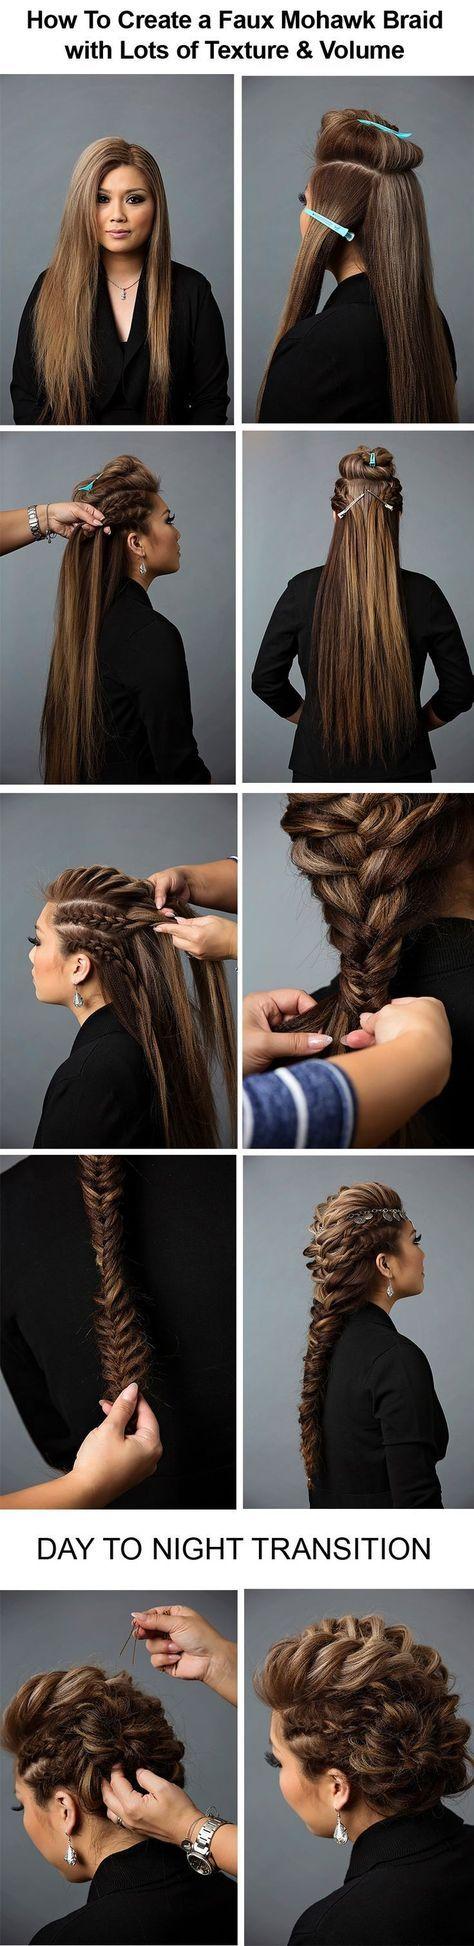 best hair stuff images on pinterest hair ideas hairstyle ideas